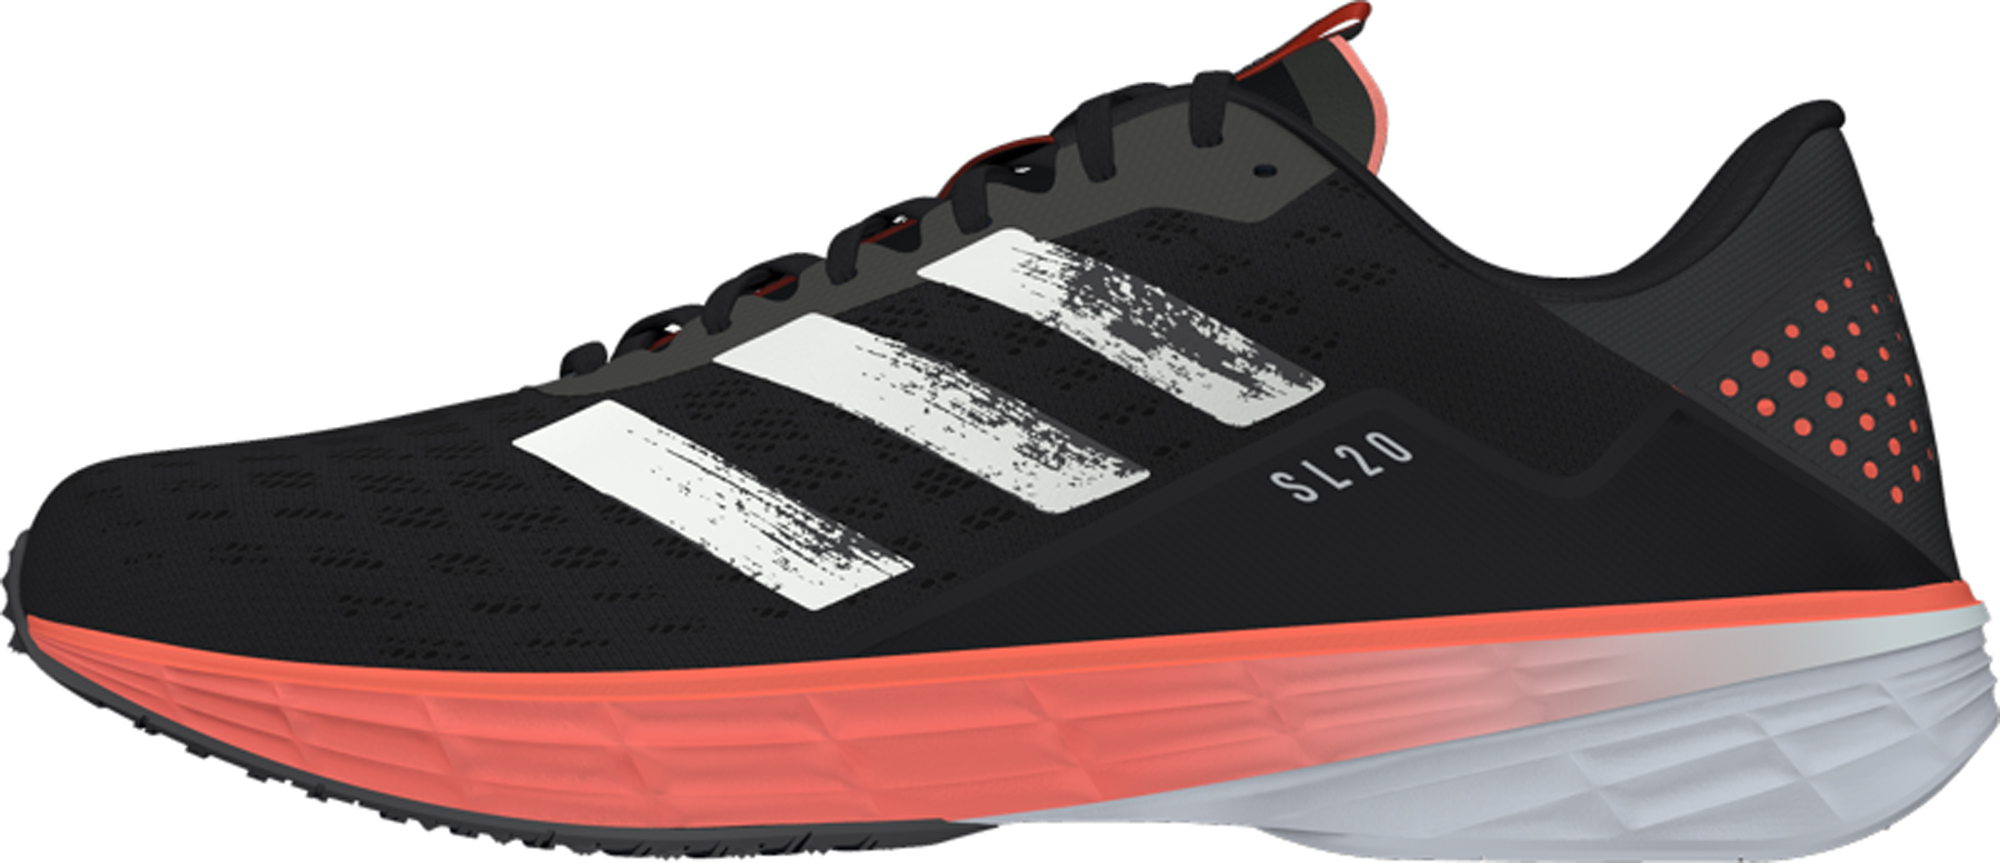 Adidas Кроссовки мужские Adidas Sl20, размер 42